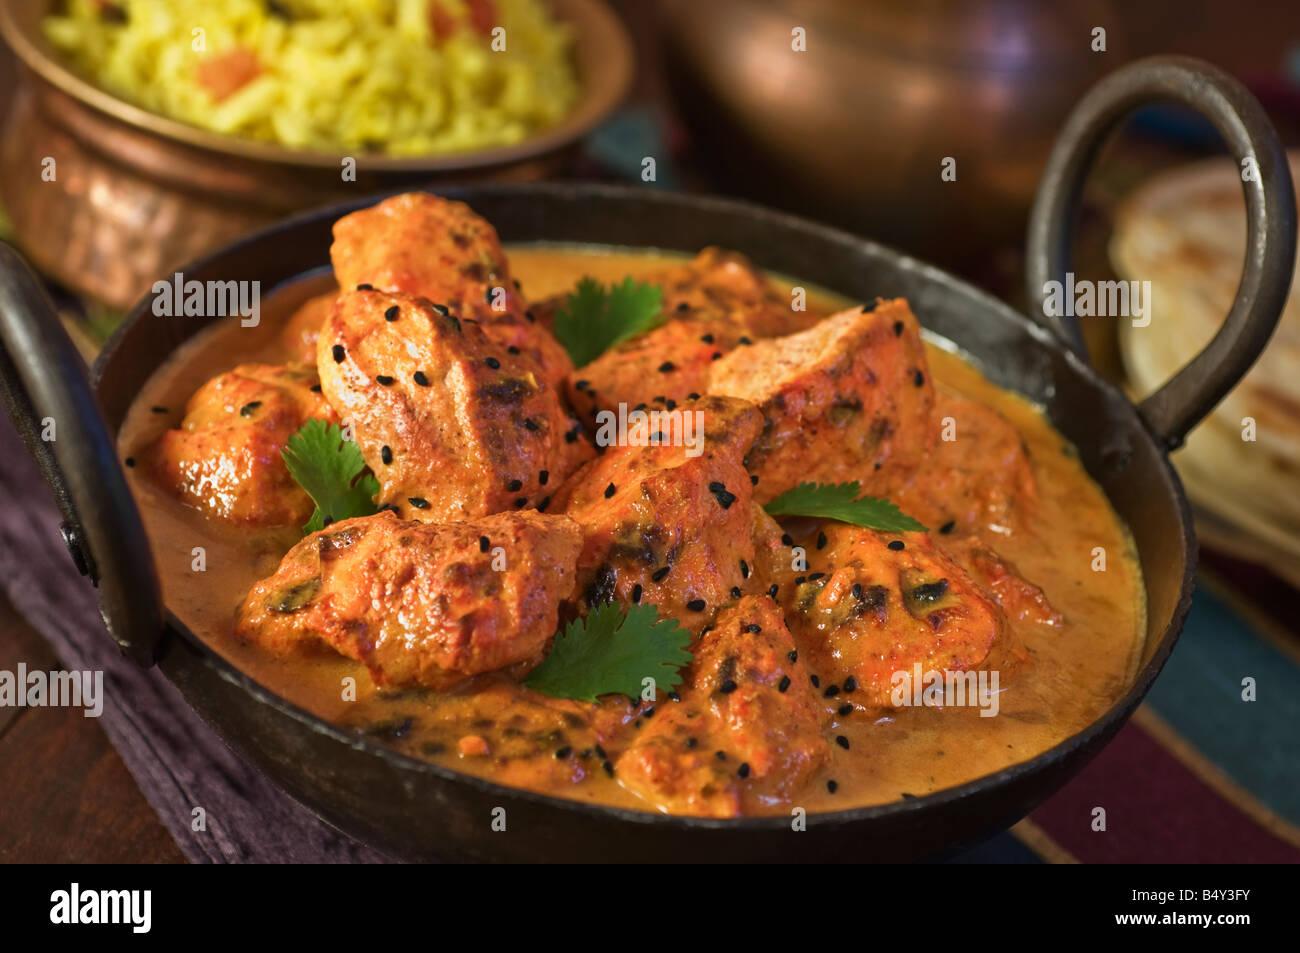 Balti chicken tikka masala curry indian food stock photo 20264495 balti chicken tikka masala curry indian food forumfinder Choice Image